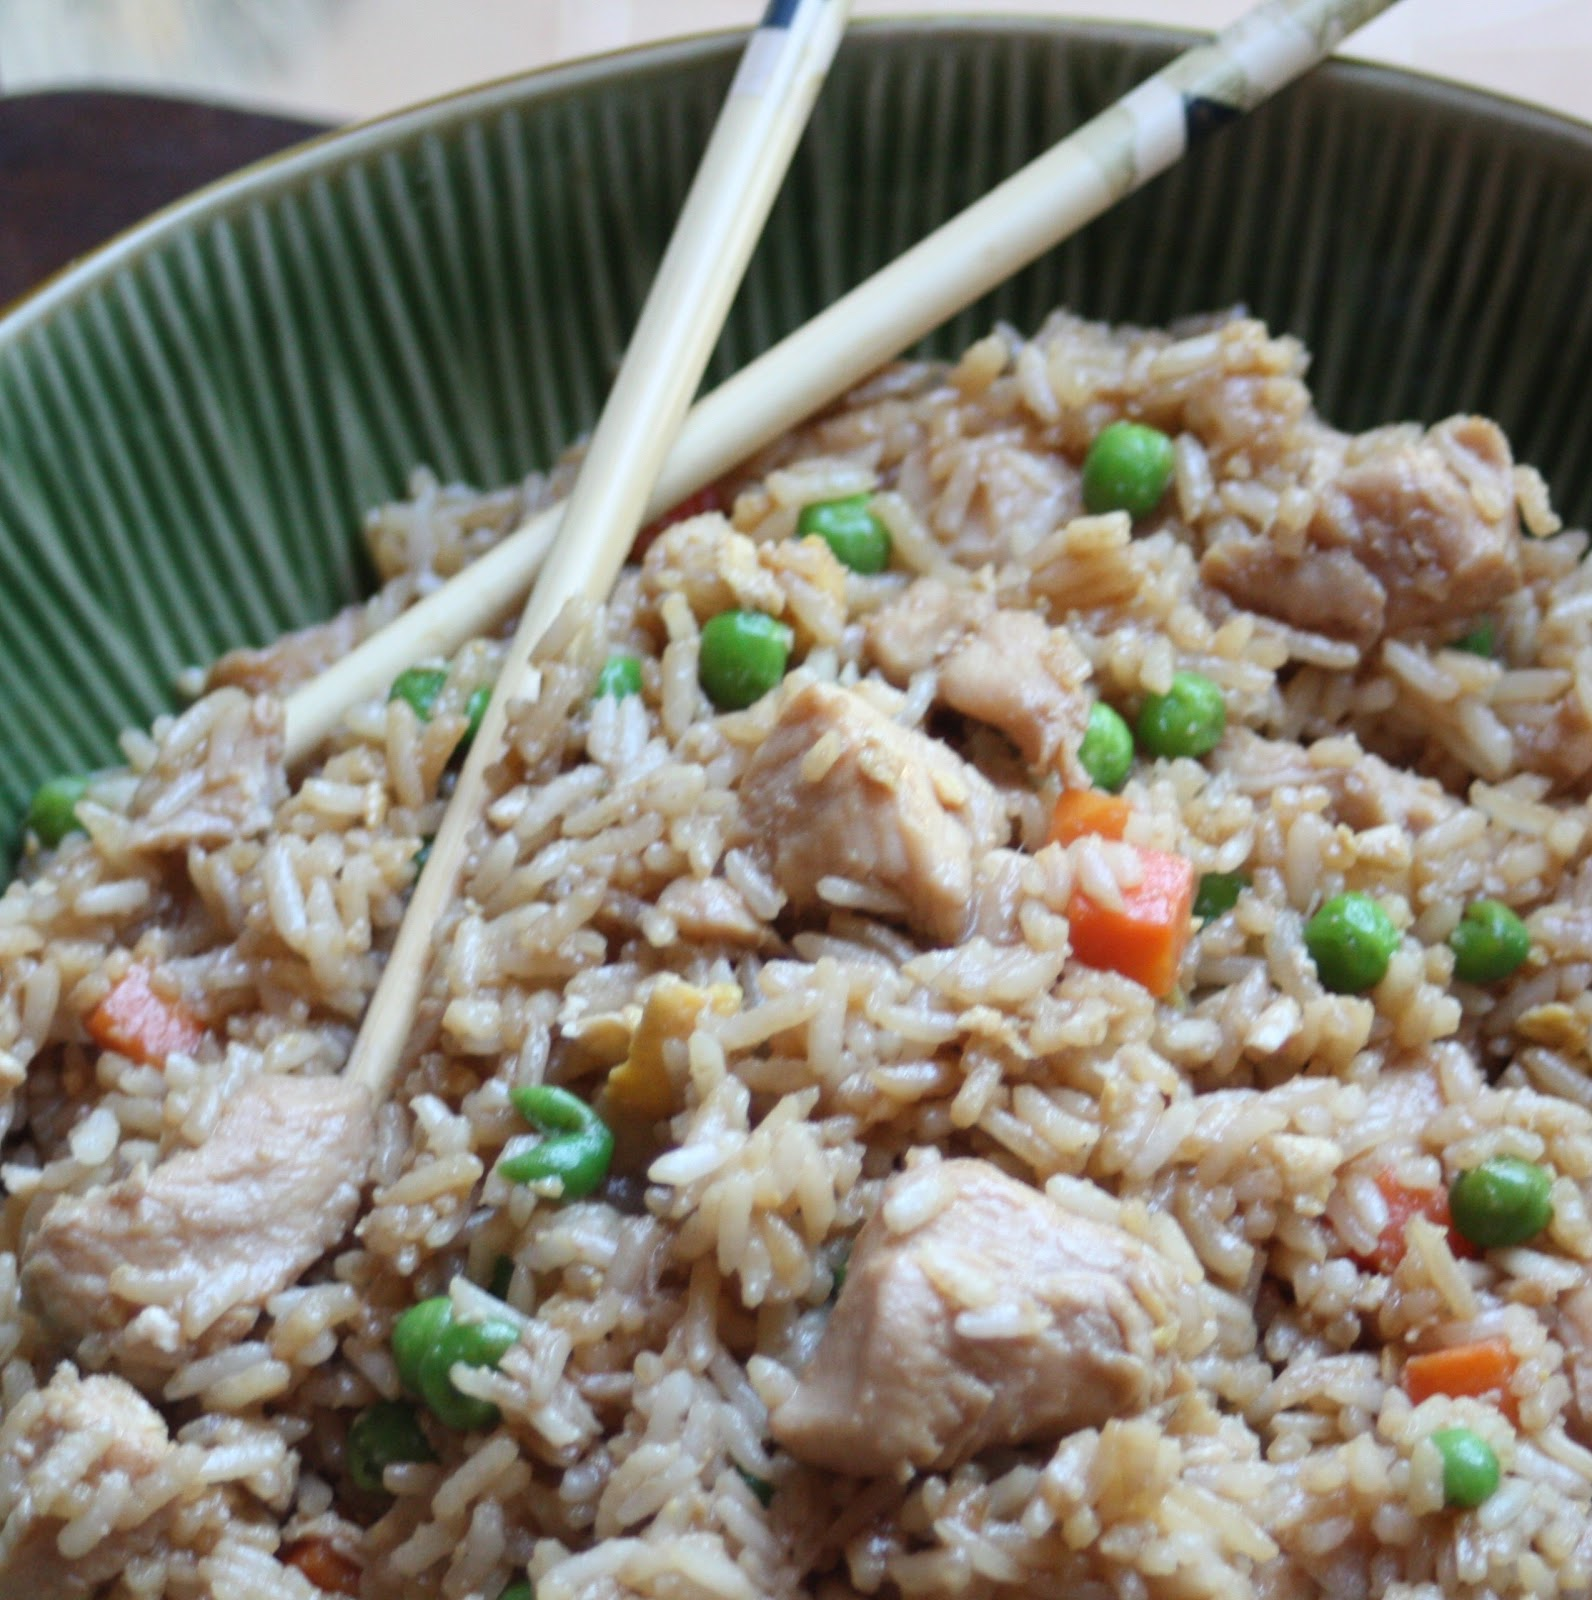 Paper Plates and China: Teryaki Chicken Fried Rice